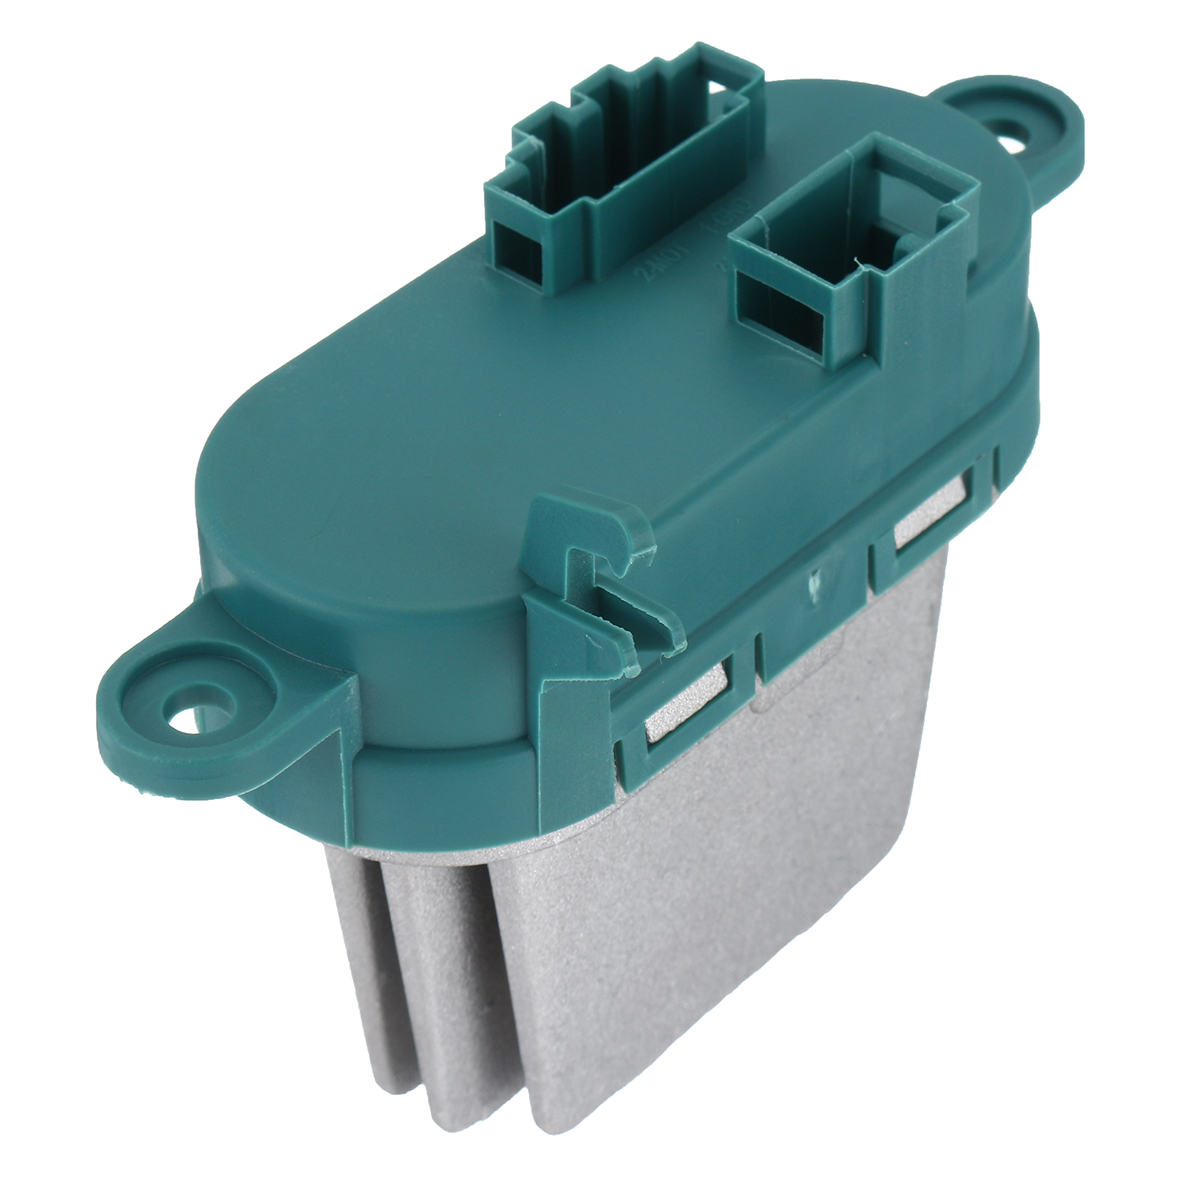 HVAC Blower Fan Motor Heater Resistor For Audi Q7 VW Touareg Seat # 7L0907521